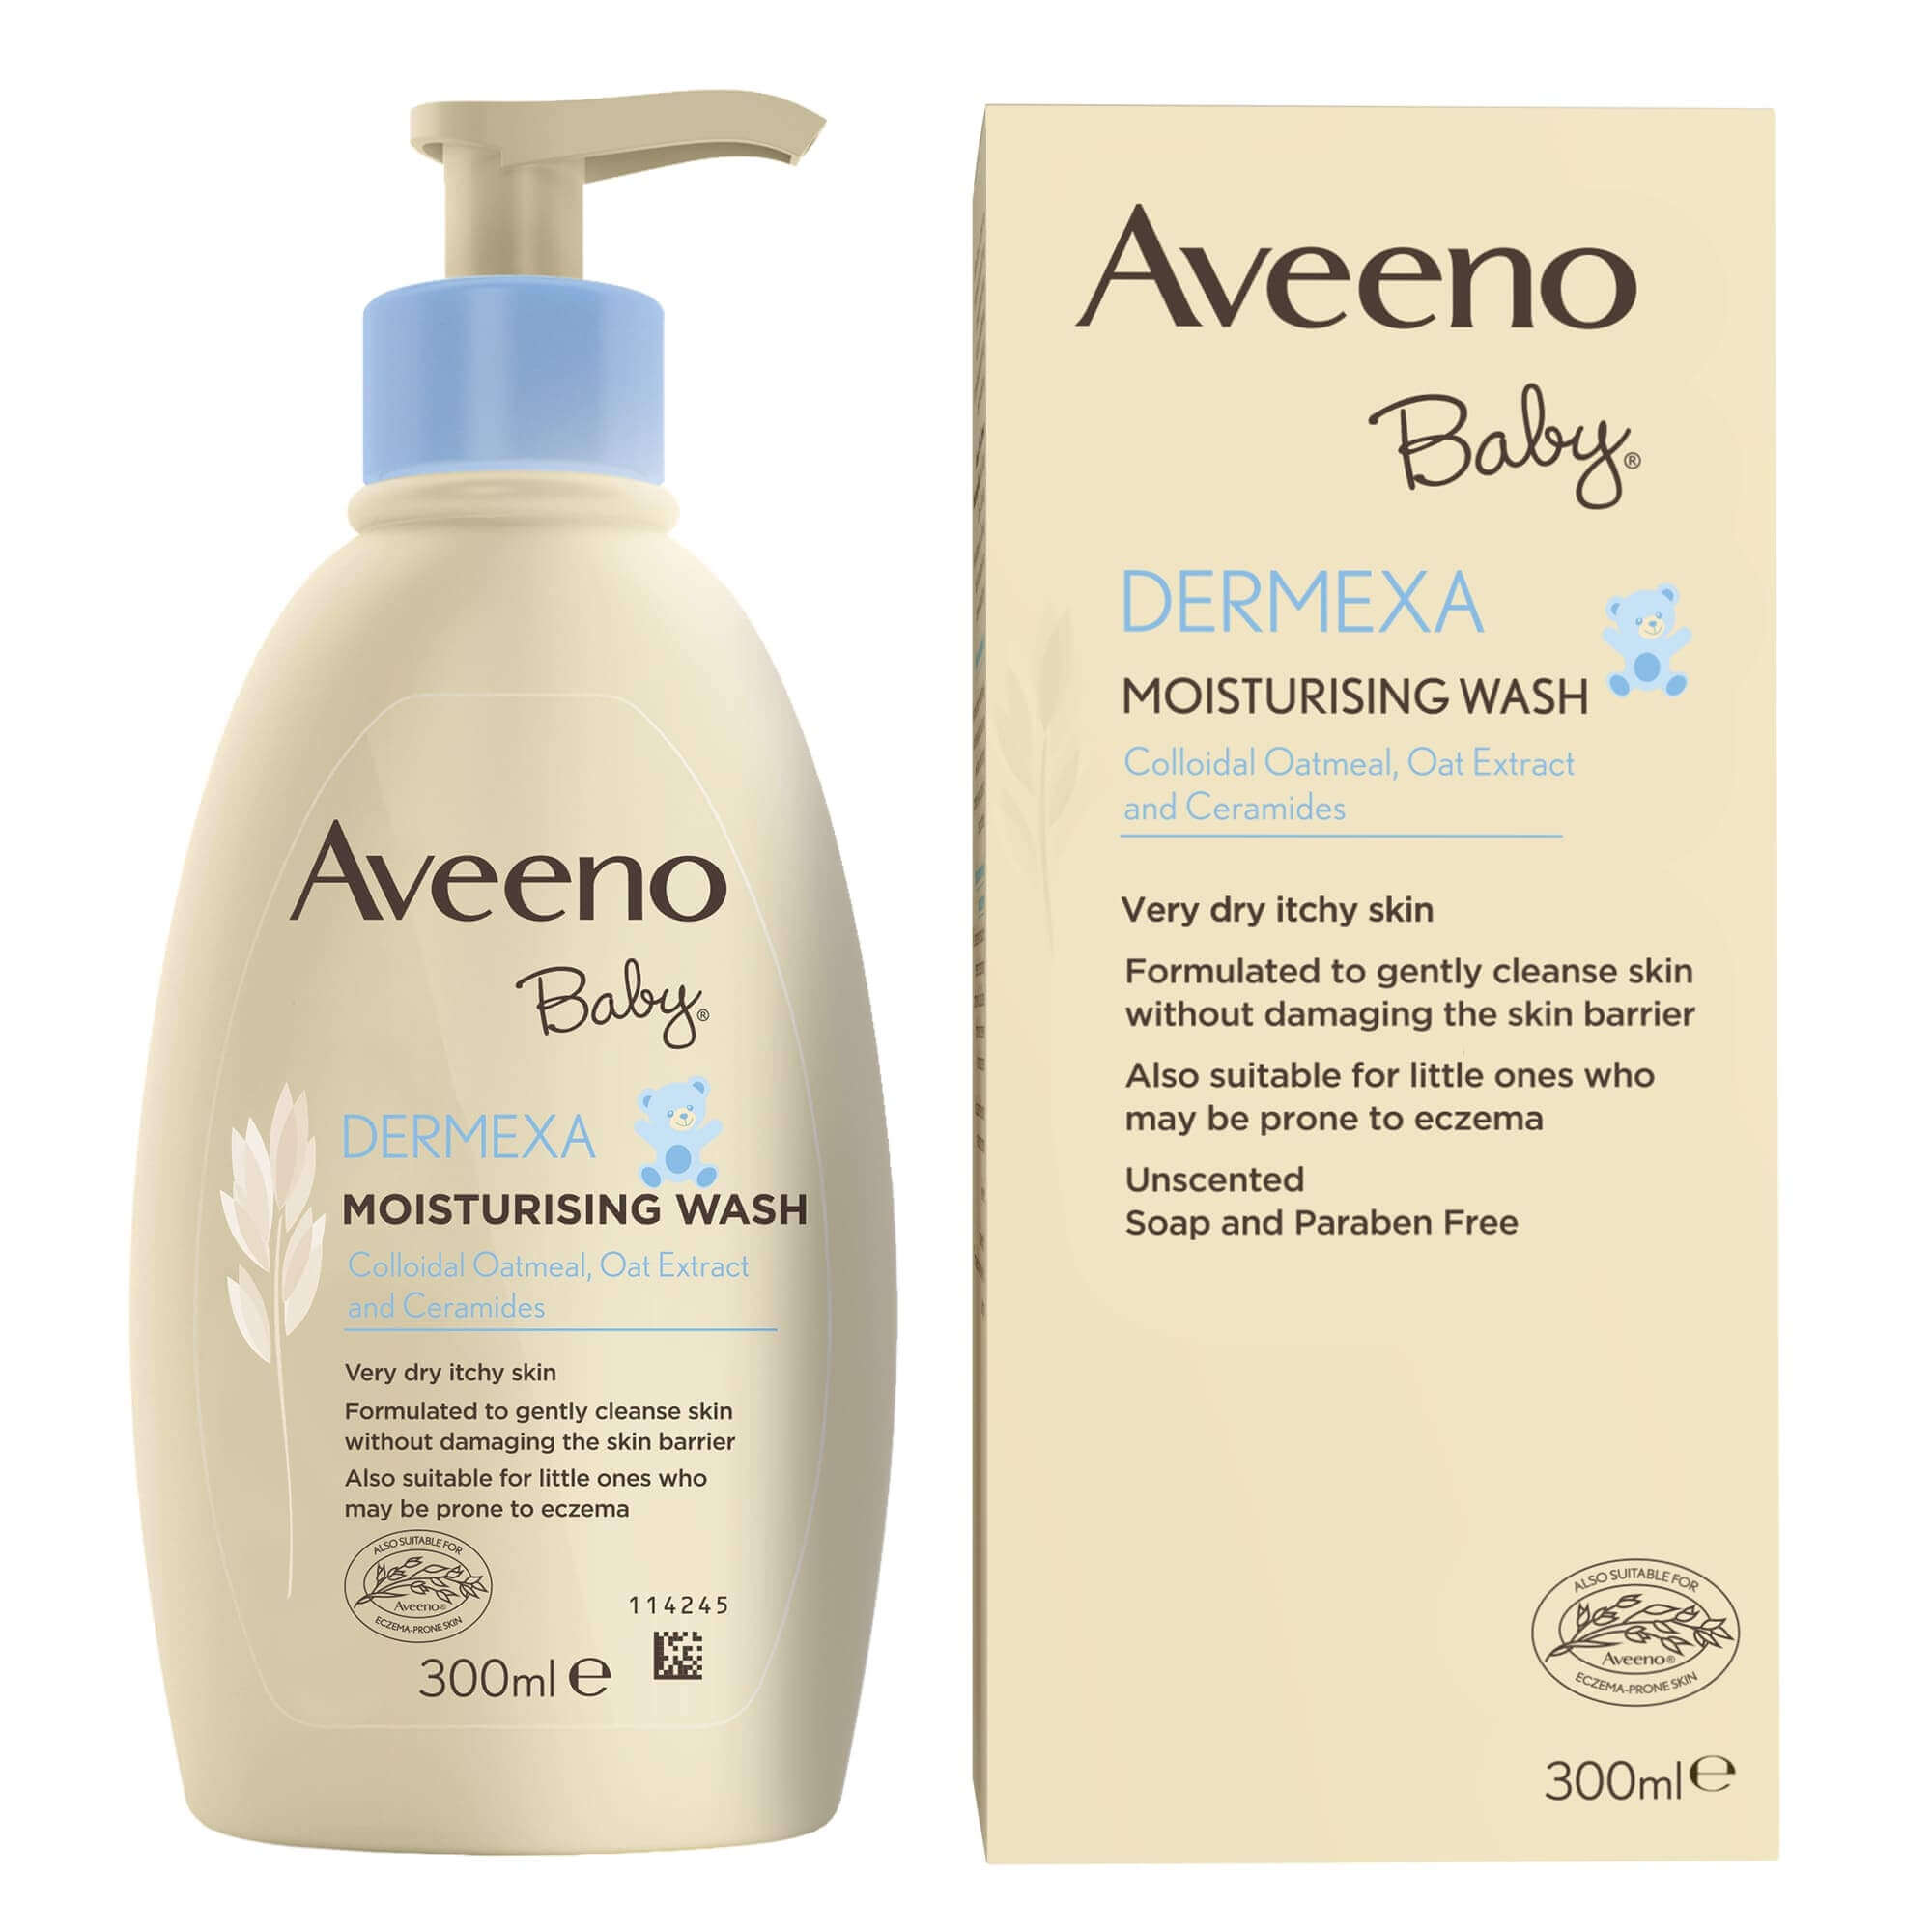 aveeno baby dermexa wash review sanwarna.pk